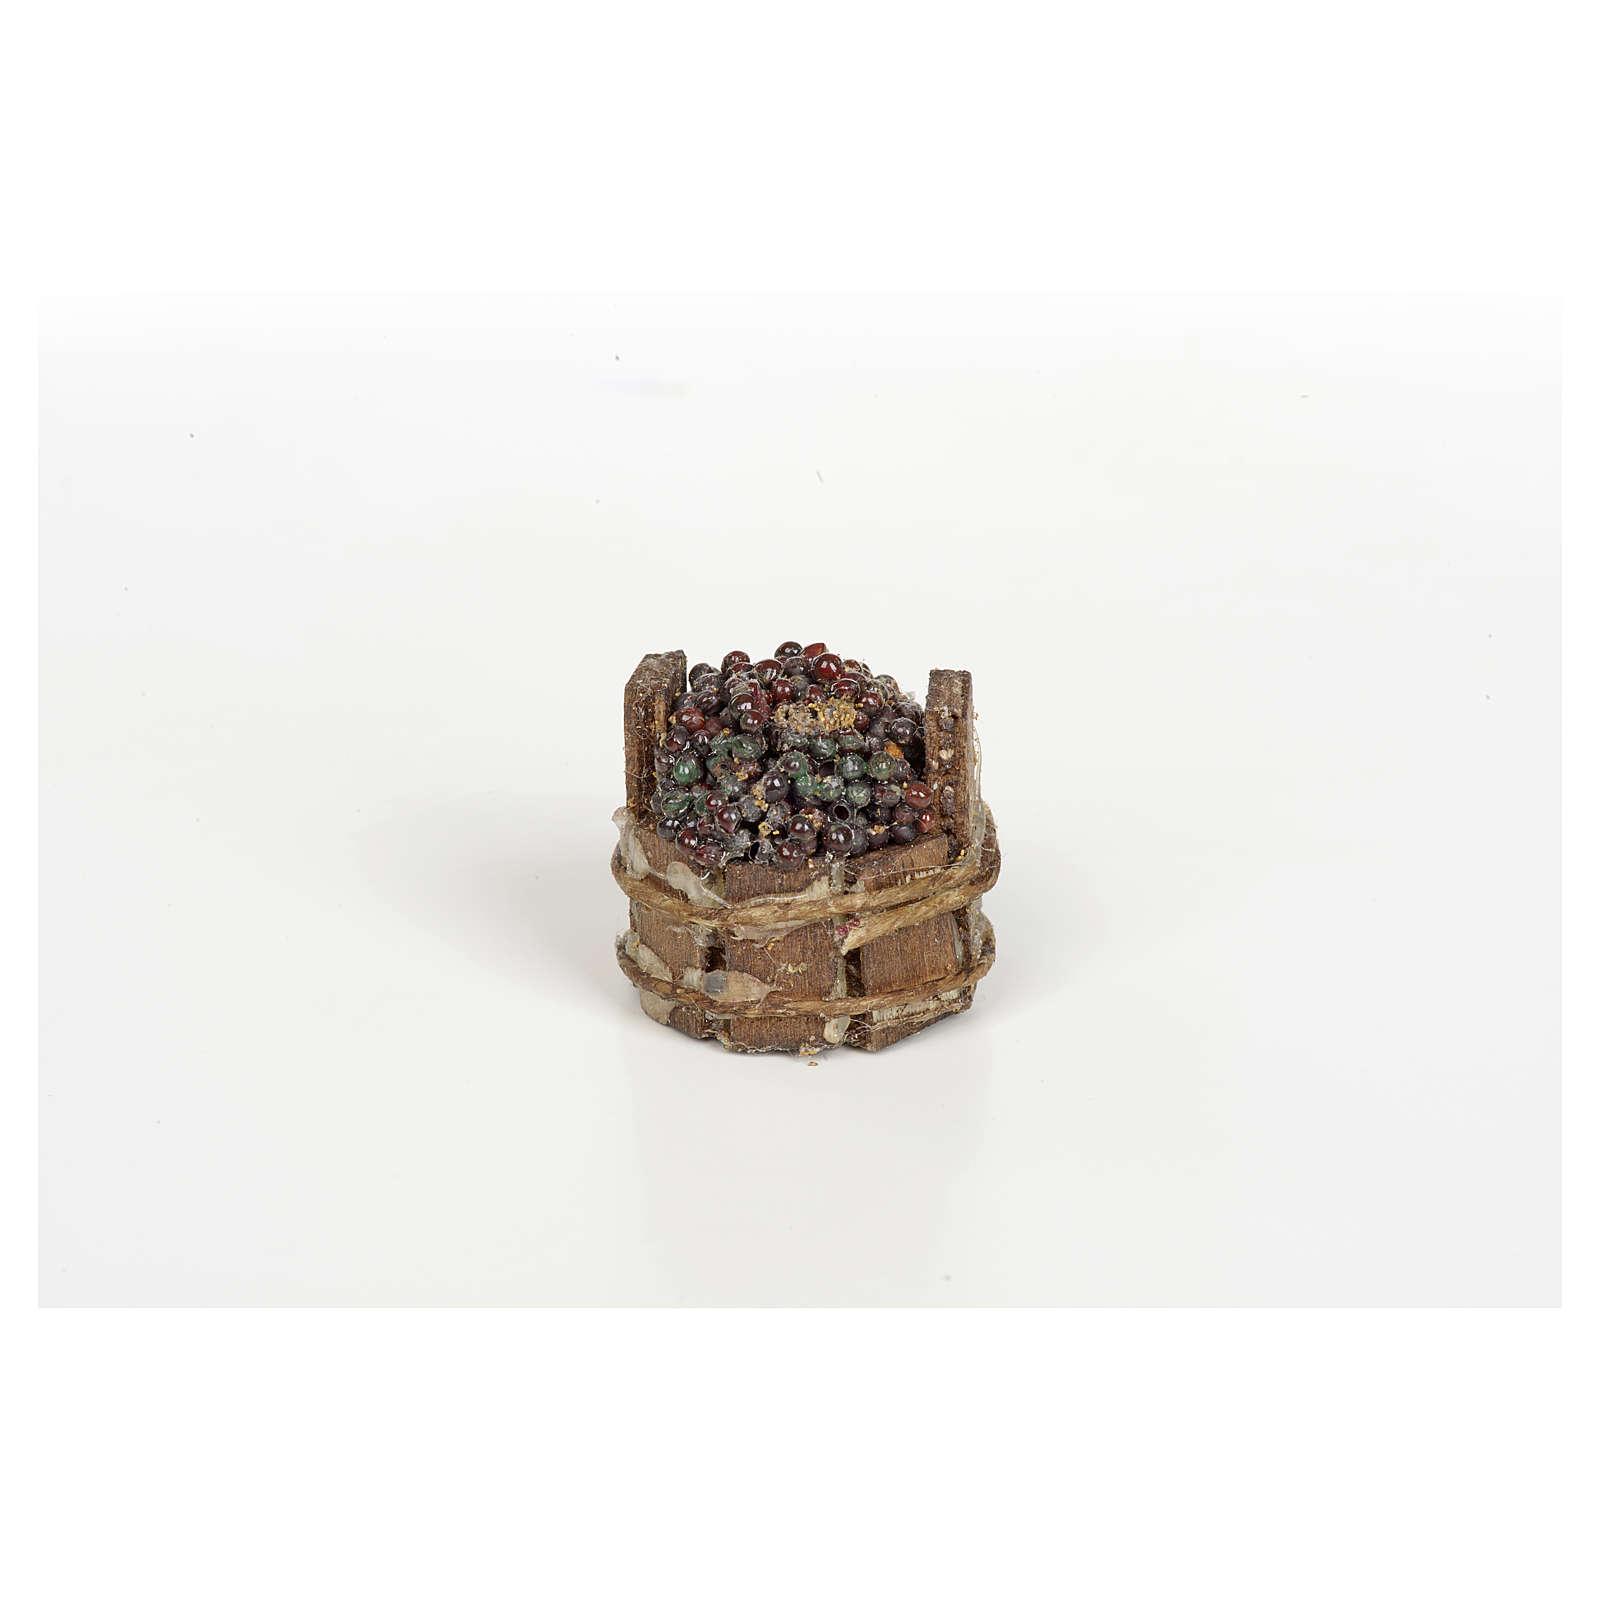 Tinozza uva nera presepe Napoli diam 3 cm 4